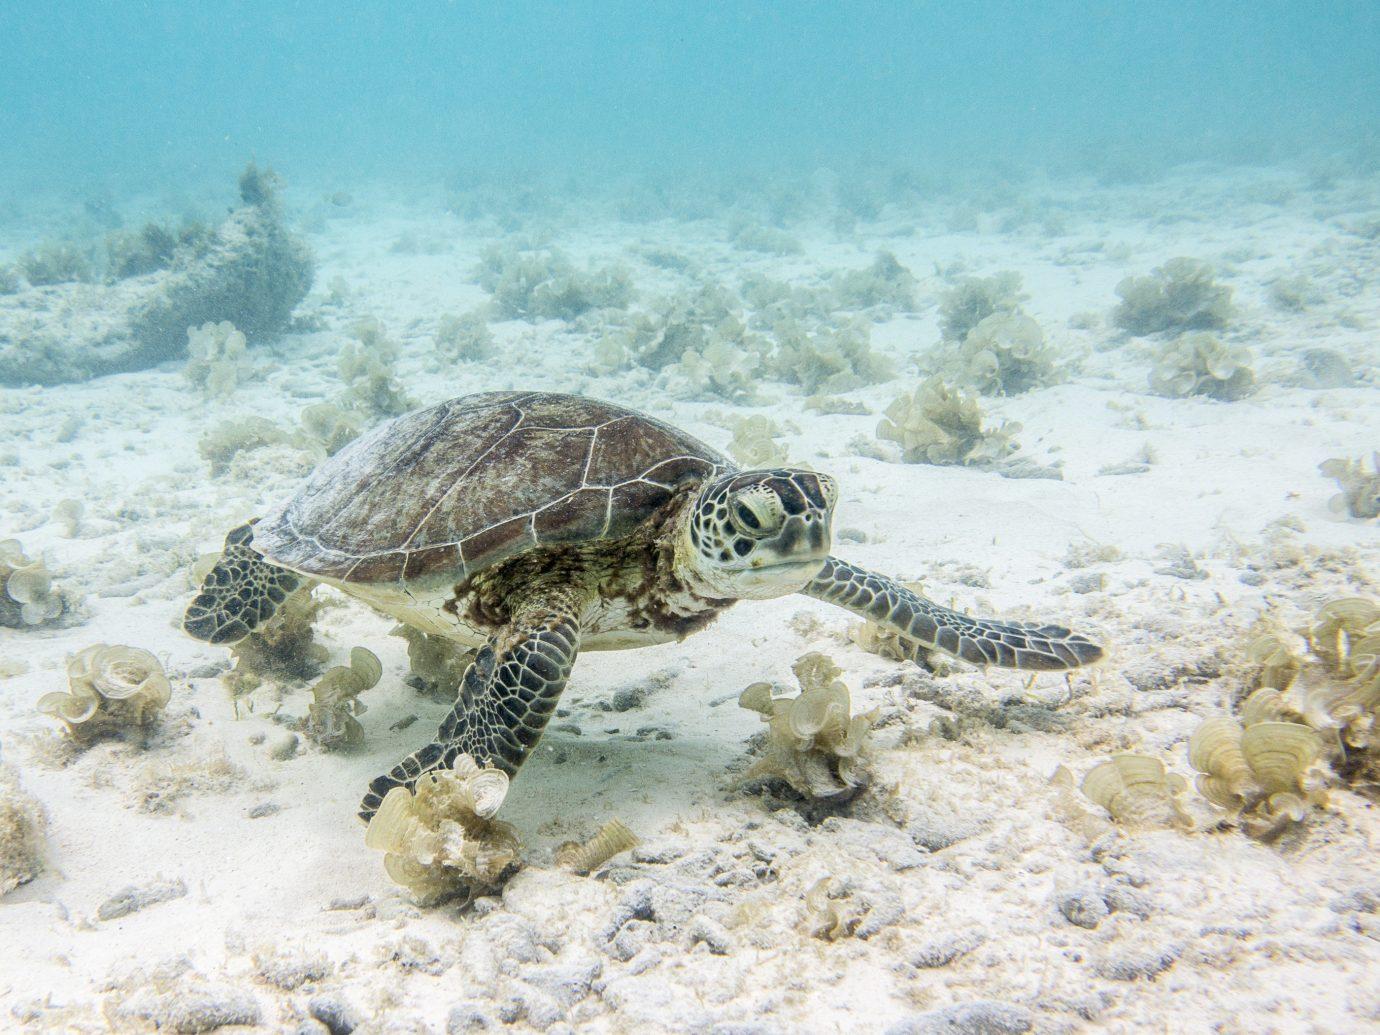 Beaches caribbean Trip Ideas reptile turtle sea turtle animal outdoor vertebrate marine biology loggerhead fauna biology underwater Wildlife Sea coral reef ocean floor